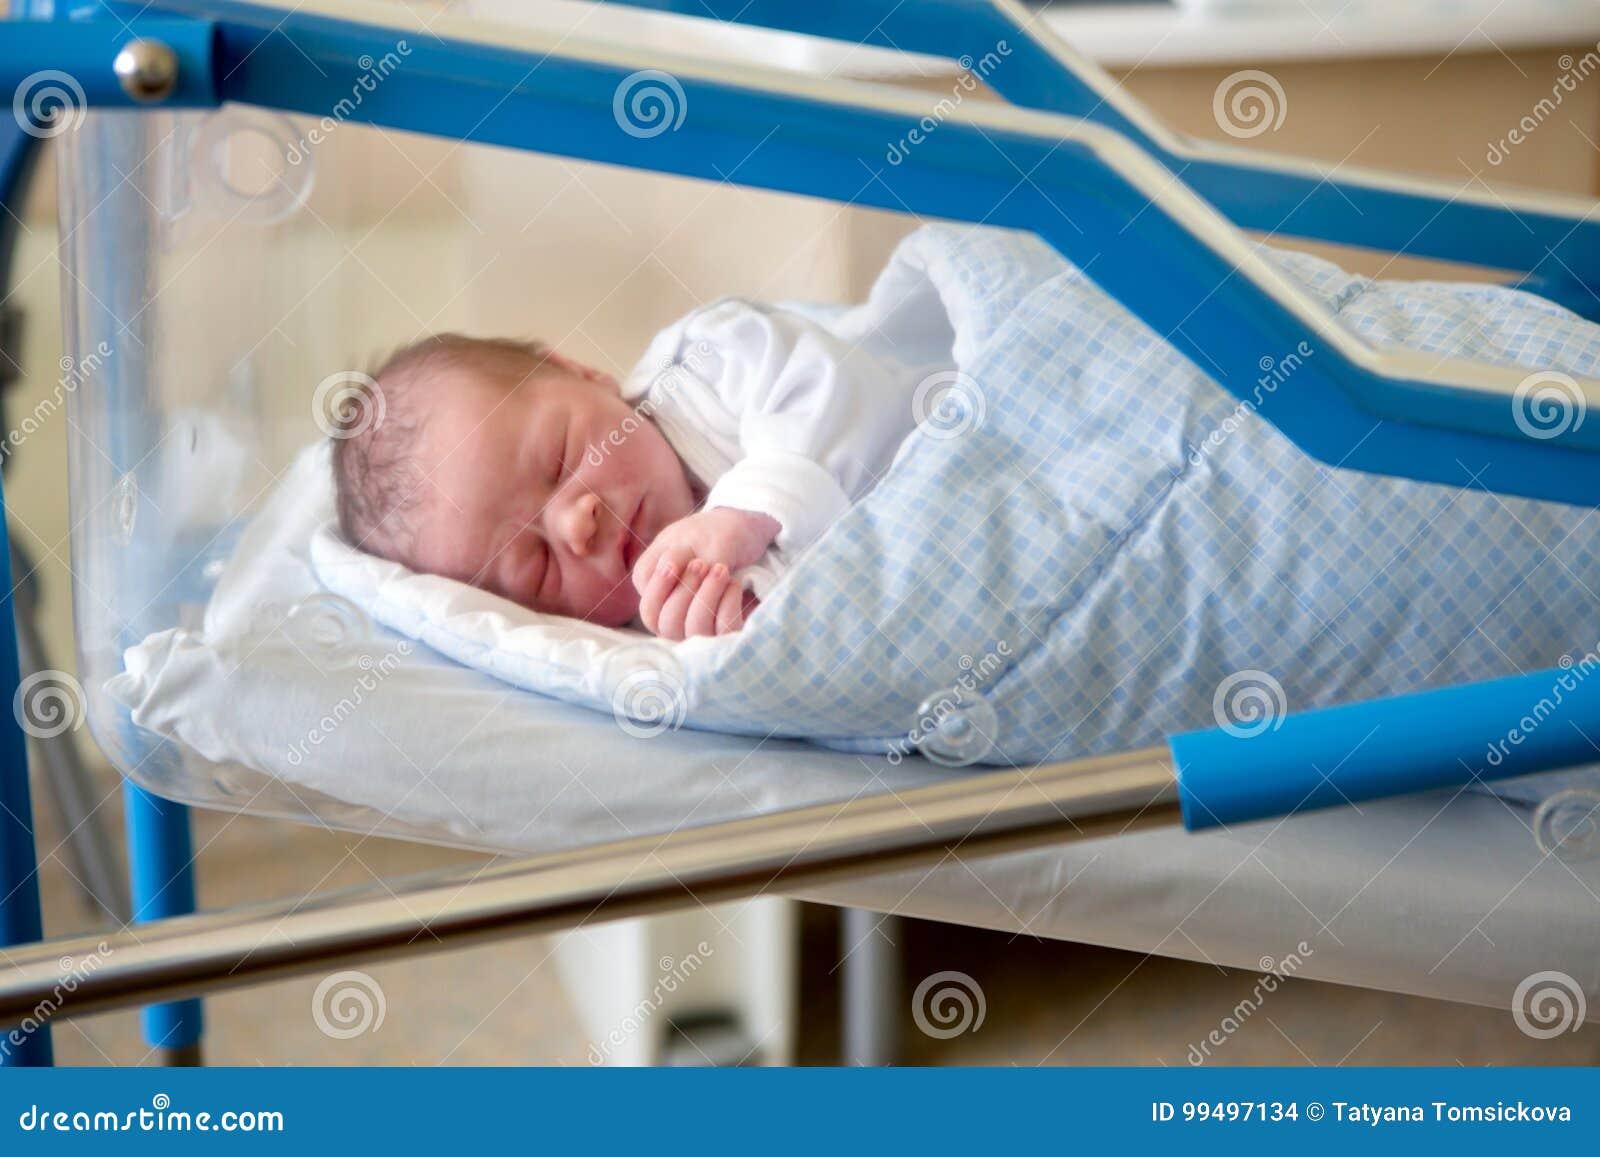 Verwonderend Newborn Baby Laying In Crib In Prenatal Hospital Stock Photo IP-48